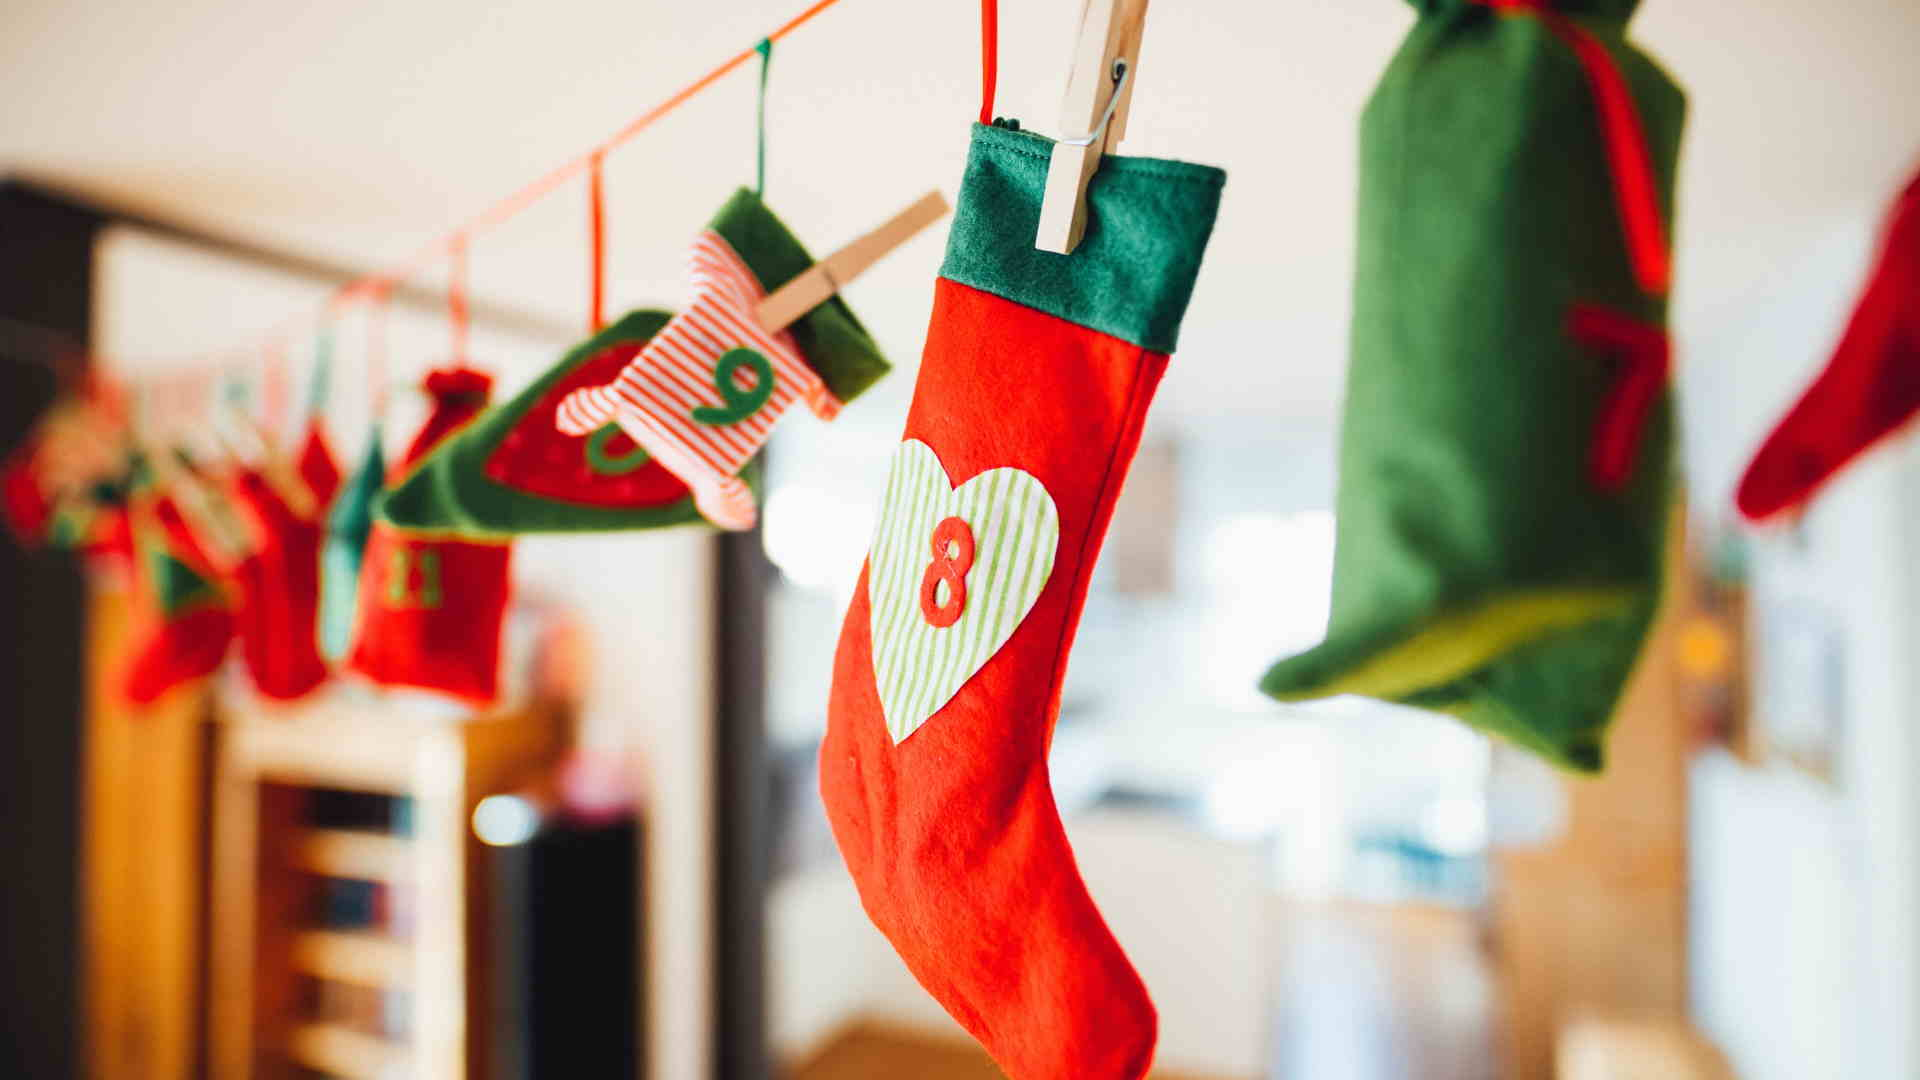 Christian Media's Christmas Countdown